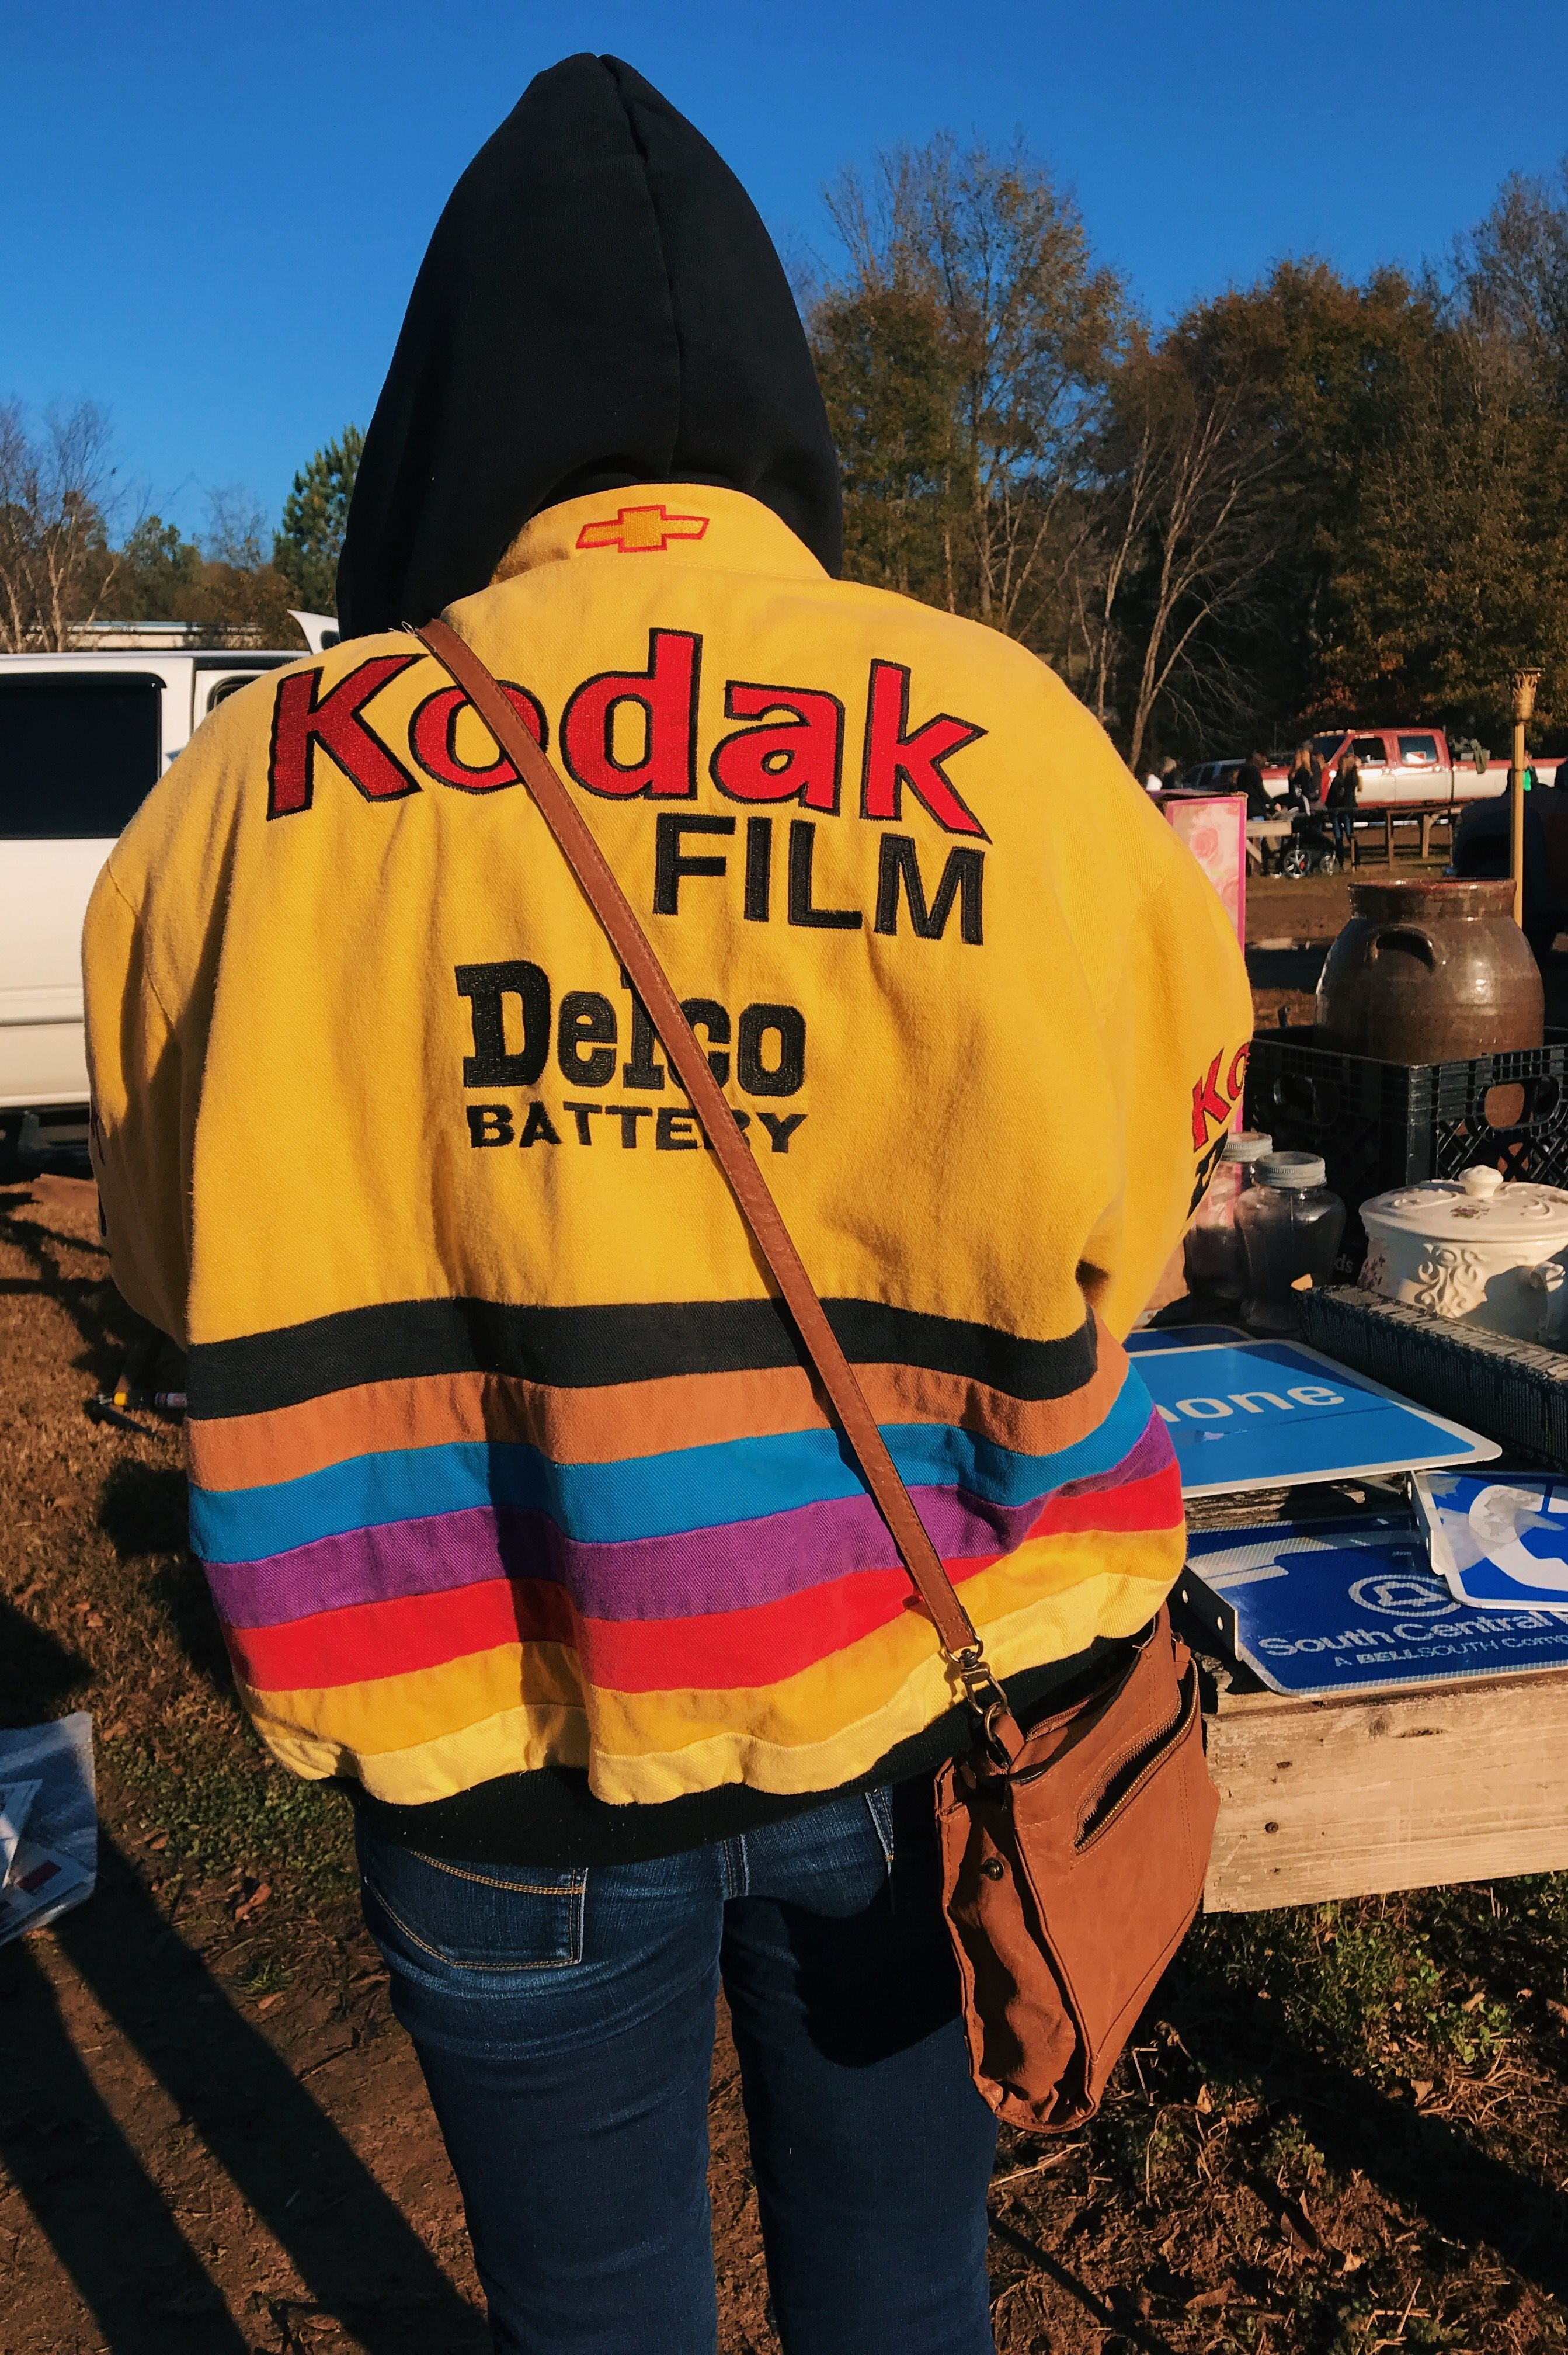 2c1c6b918 vintage kodak film nascar racing jacket | style in 2019 | Fashion ...